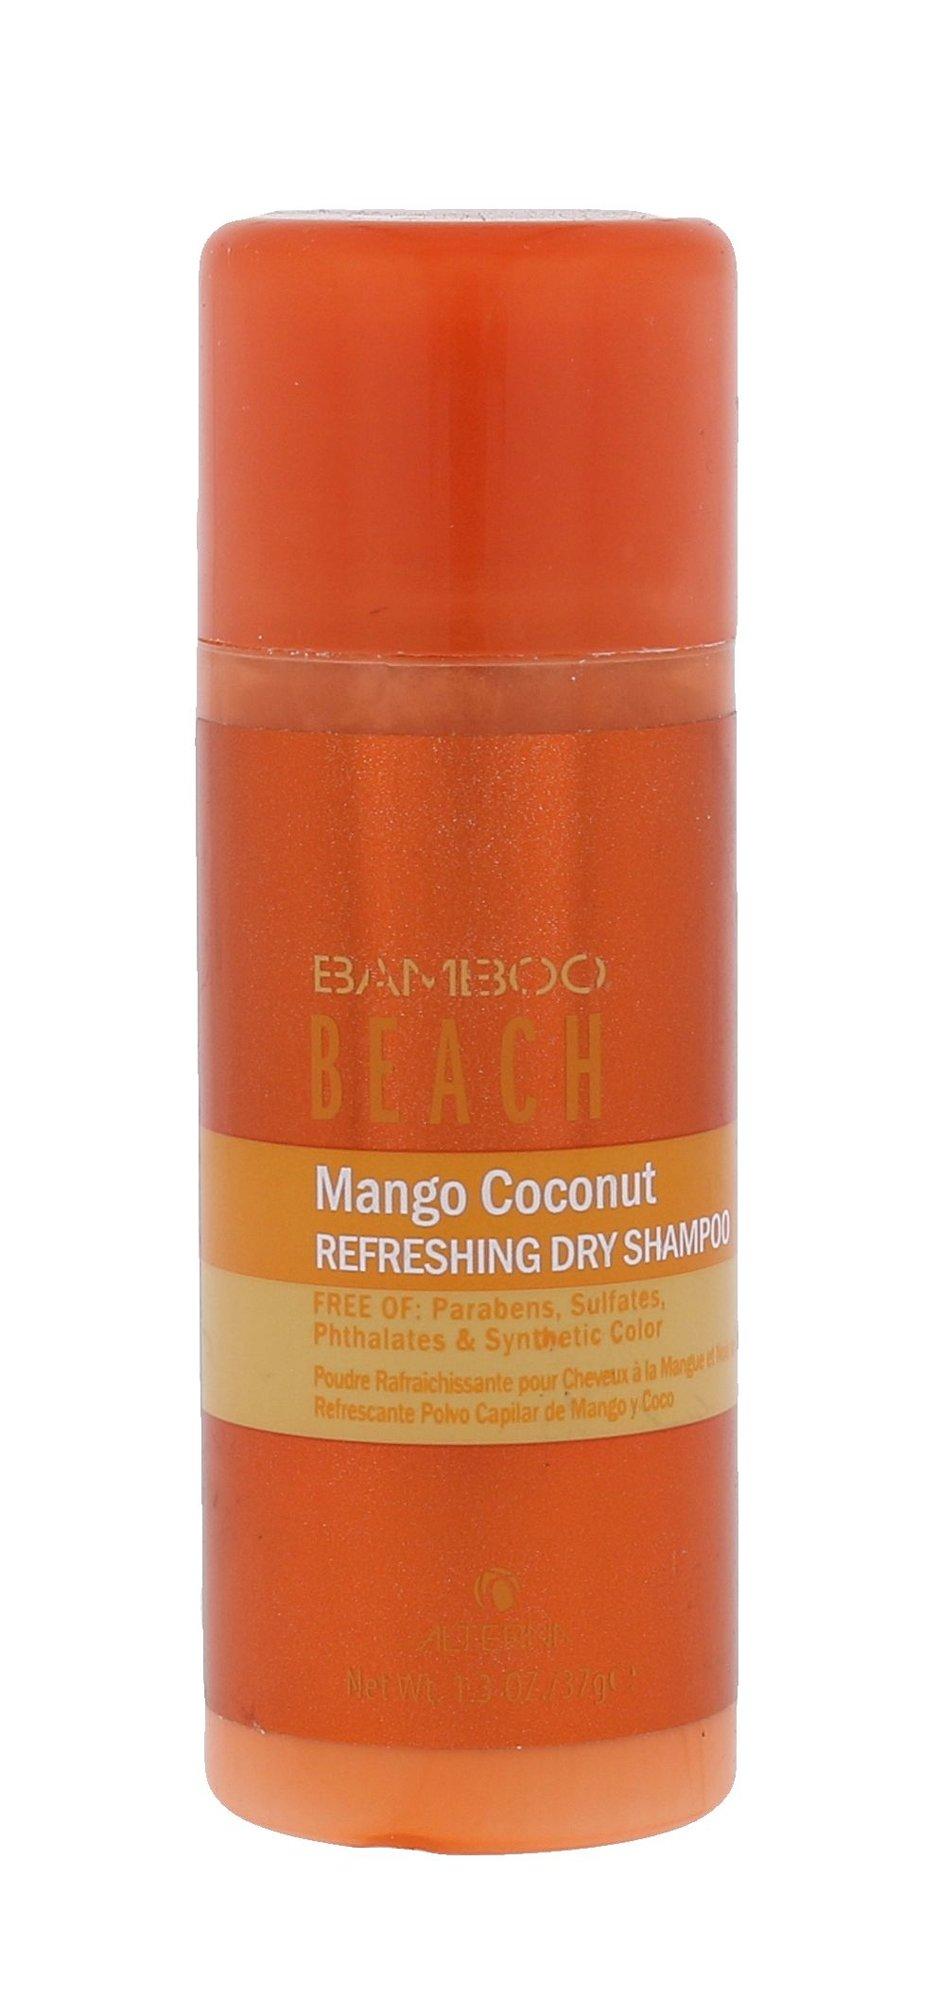 Alterna Bamboo Beach Cosmetic 37ml  Mango Coconut